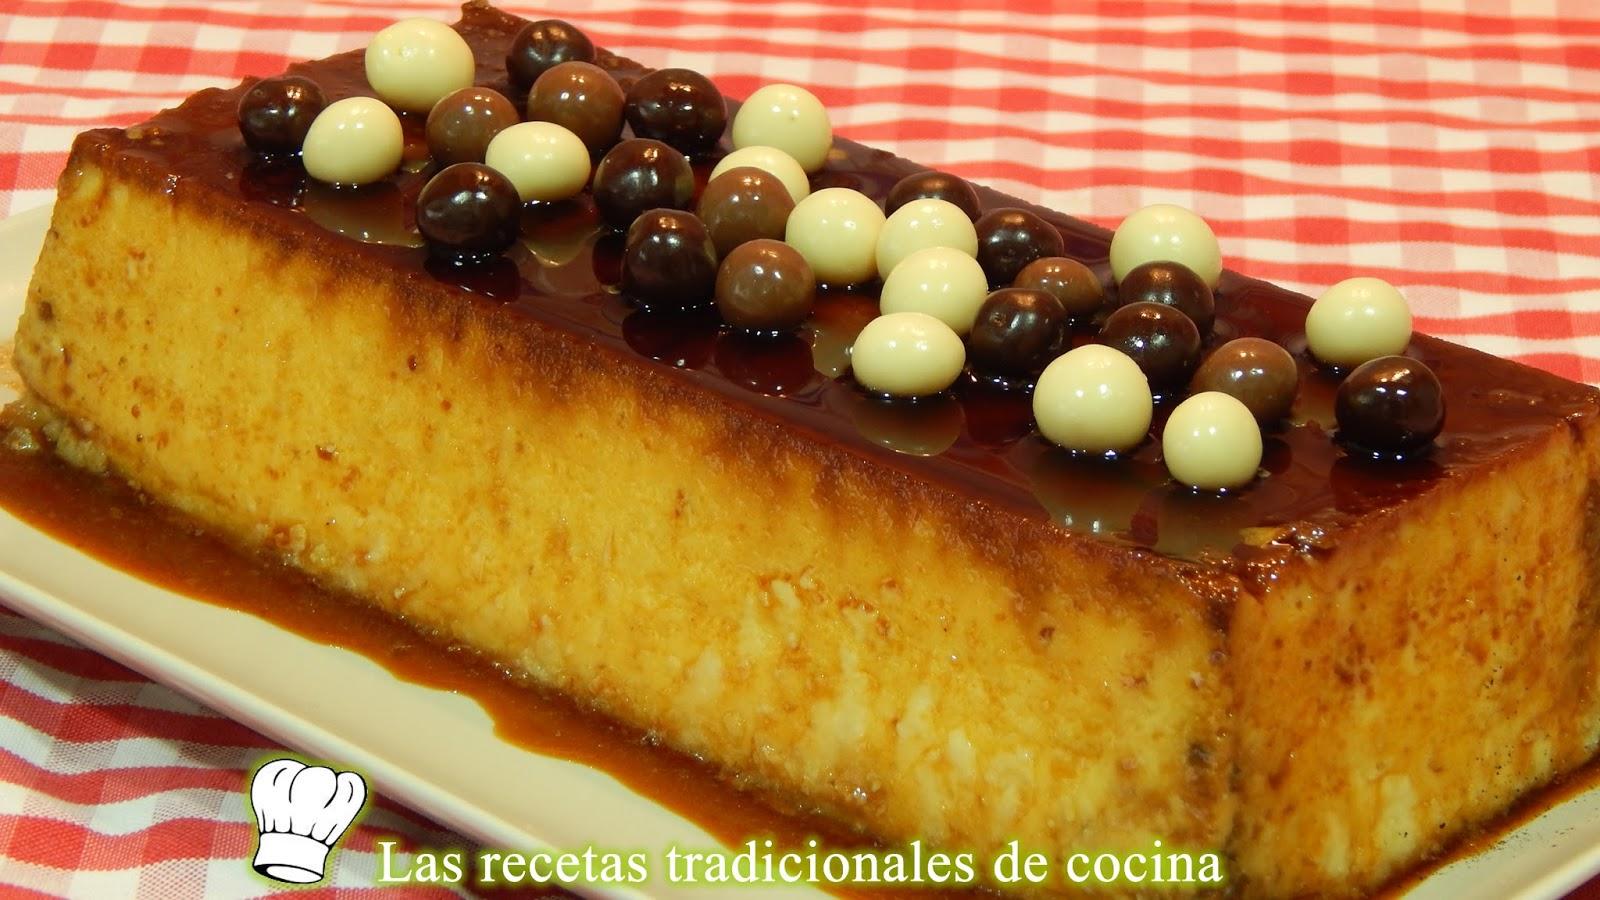 Baño Blanco De Azucar Receta:Receta de flan de chocolate blanco